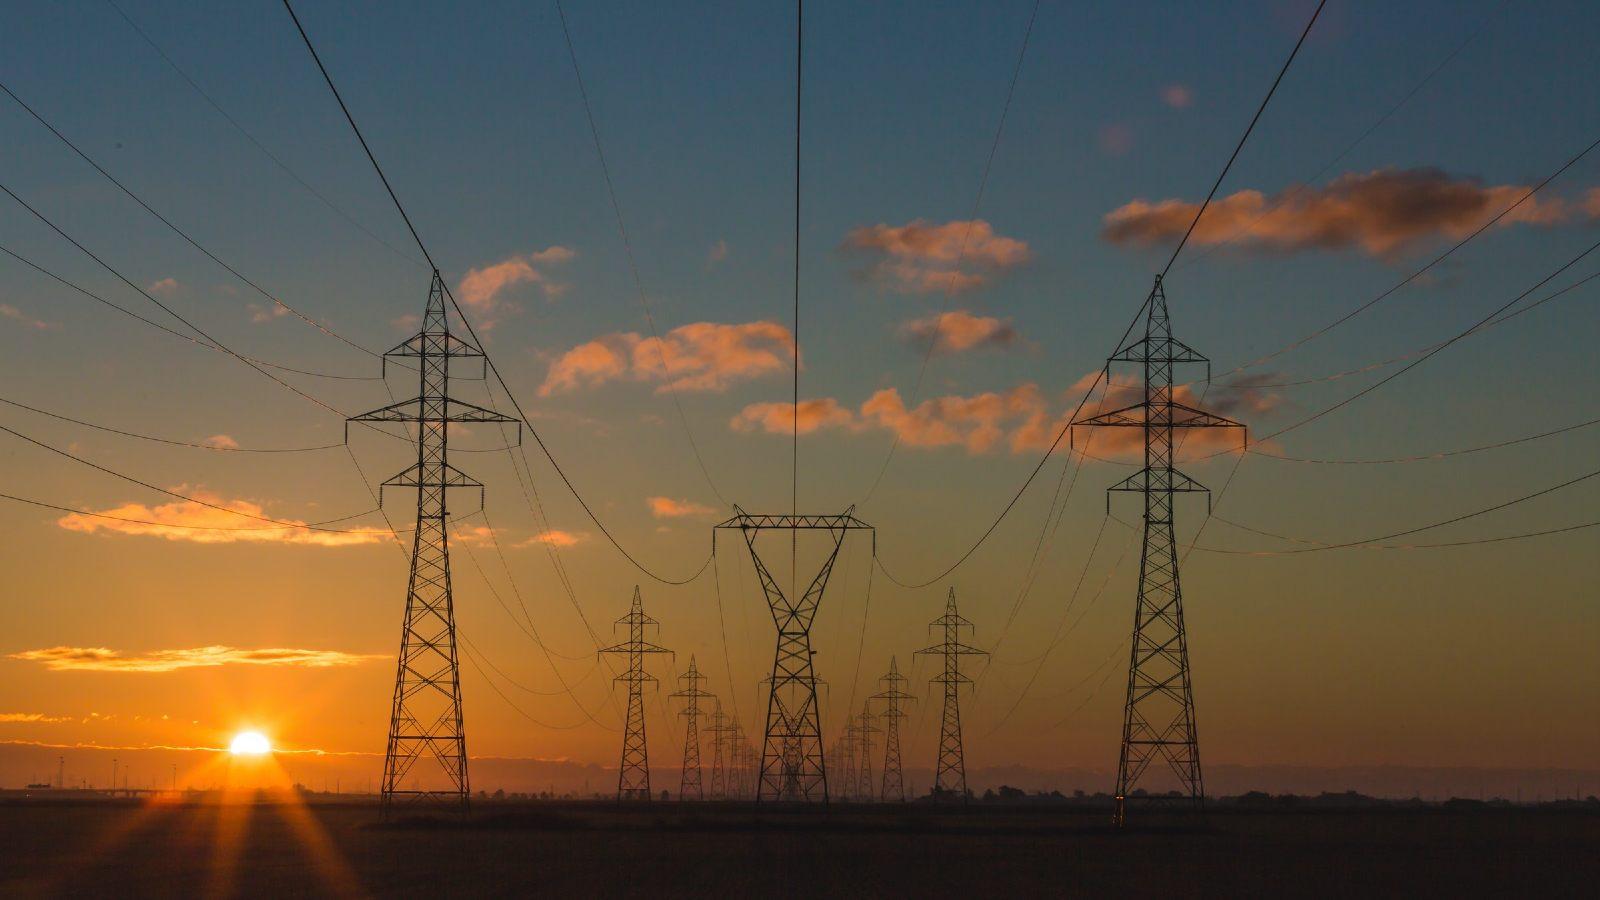 Photo: Power pylons. Credit: Matthew Henry/Unsplash